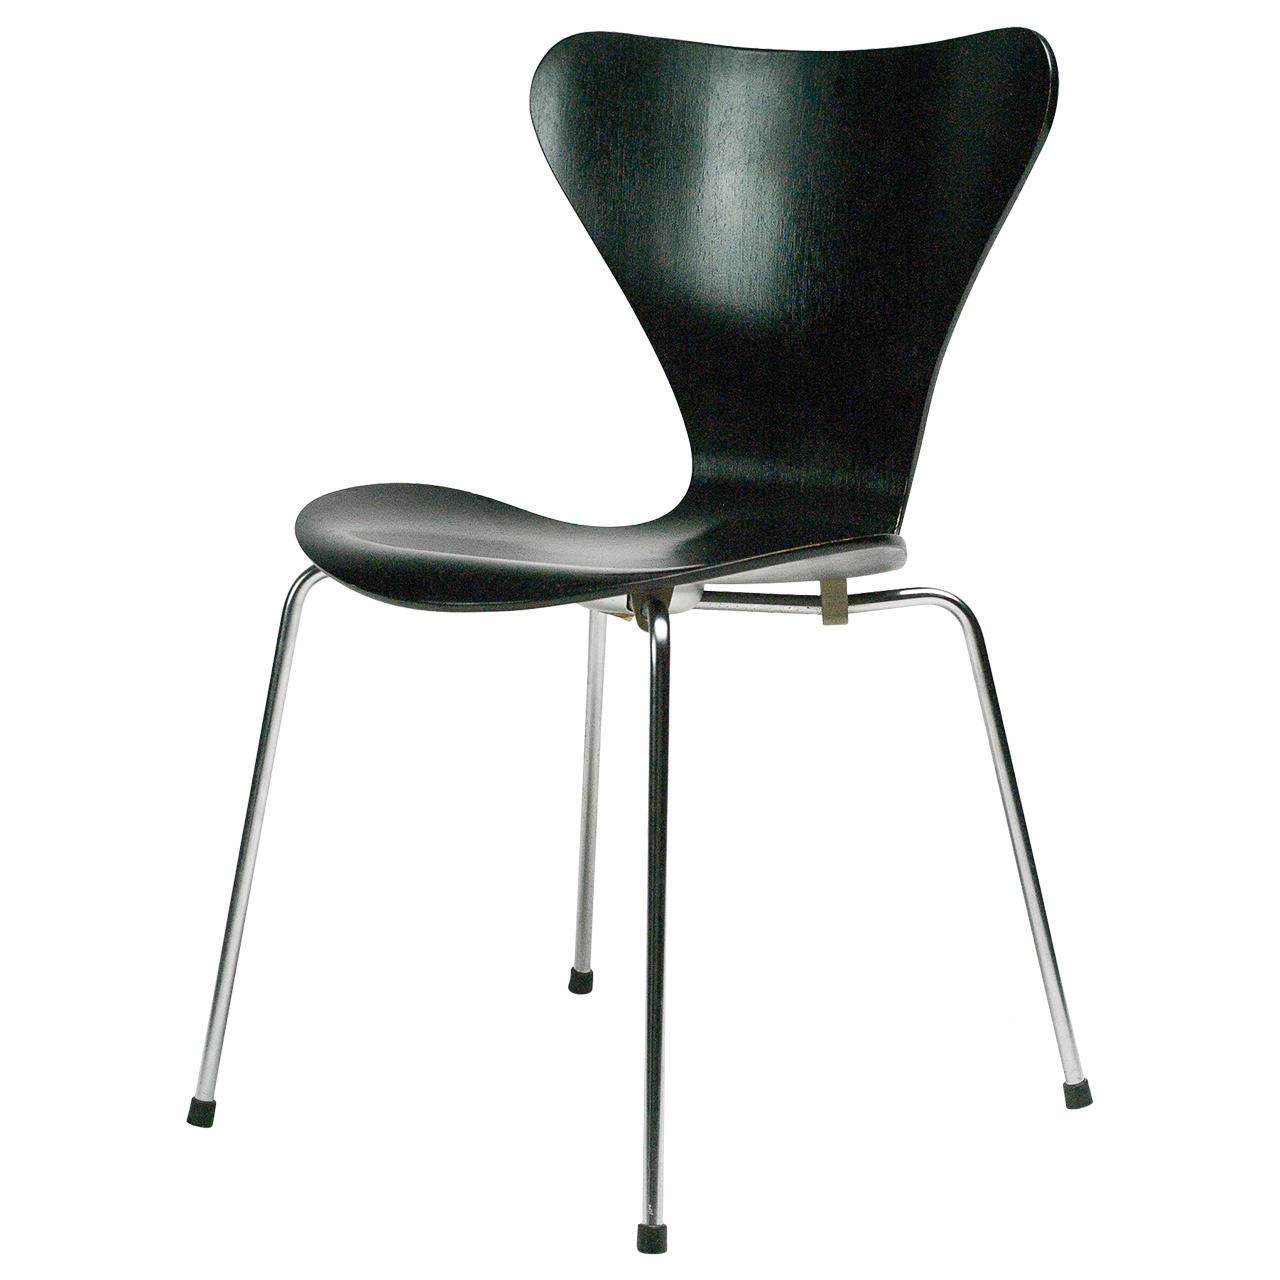 Arne jacobsen drop chair - Early Seven Series Chairs Arne Jacobsen For Fritz Hansen 1